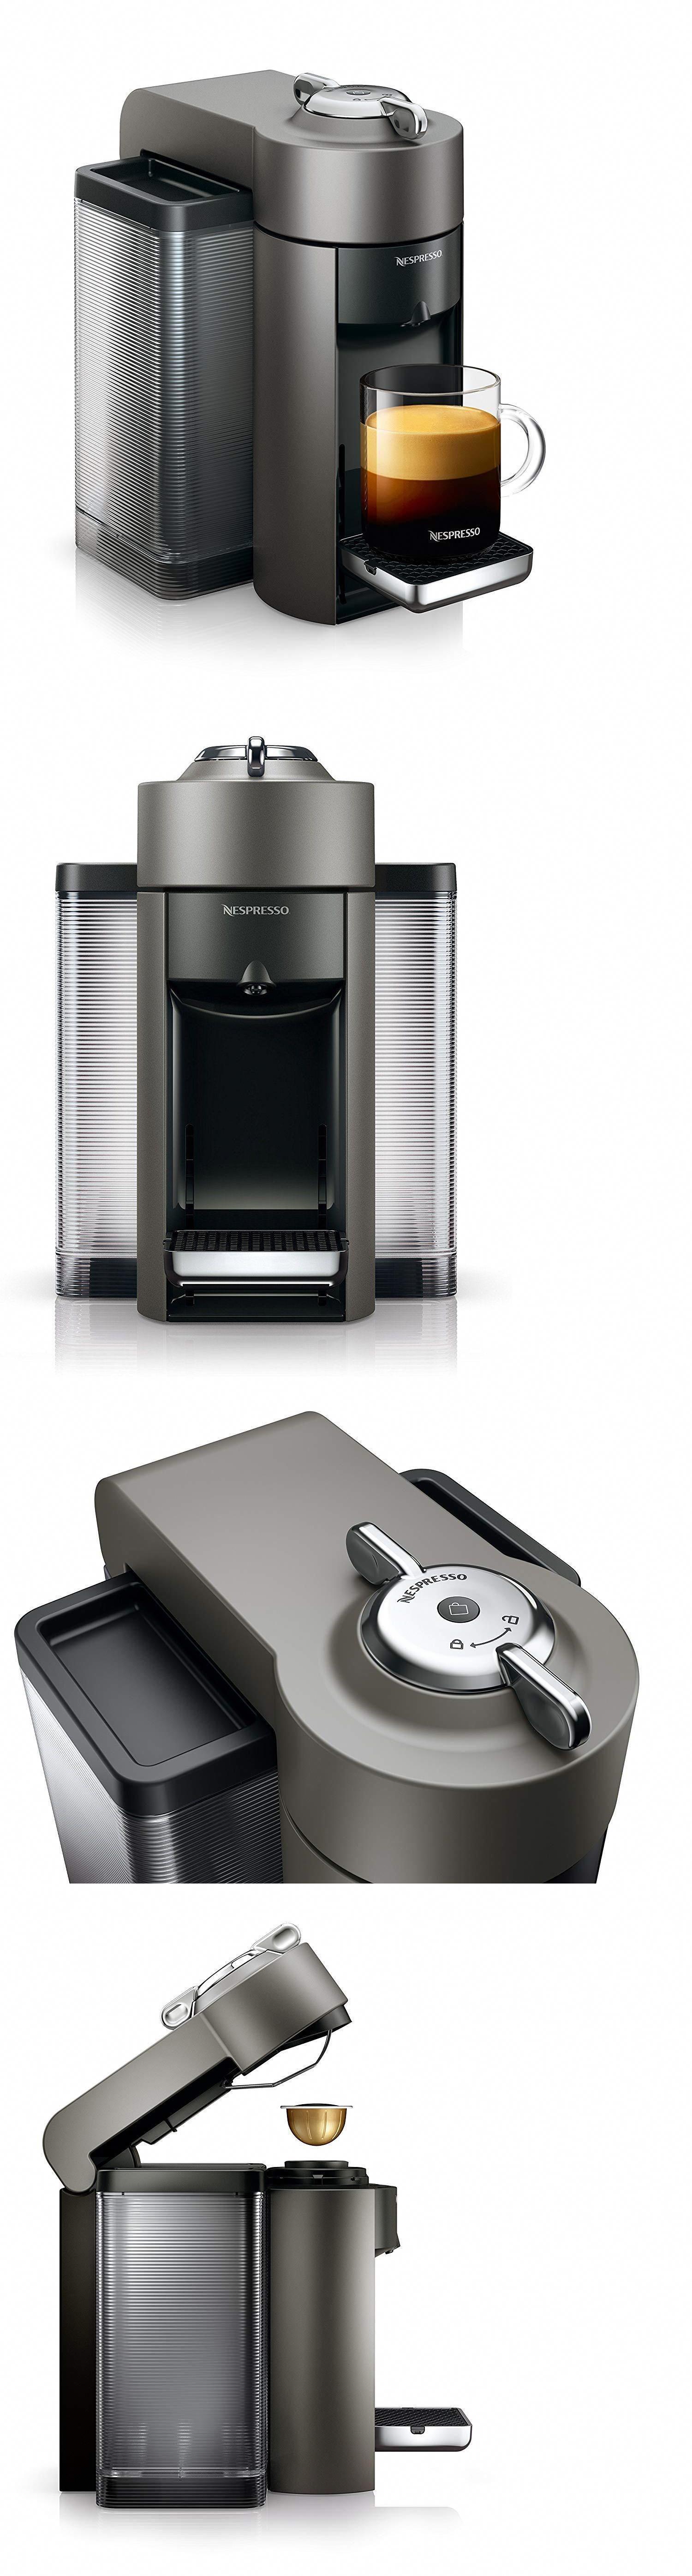 how to clean nespresso machine vertuo next